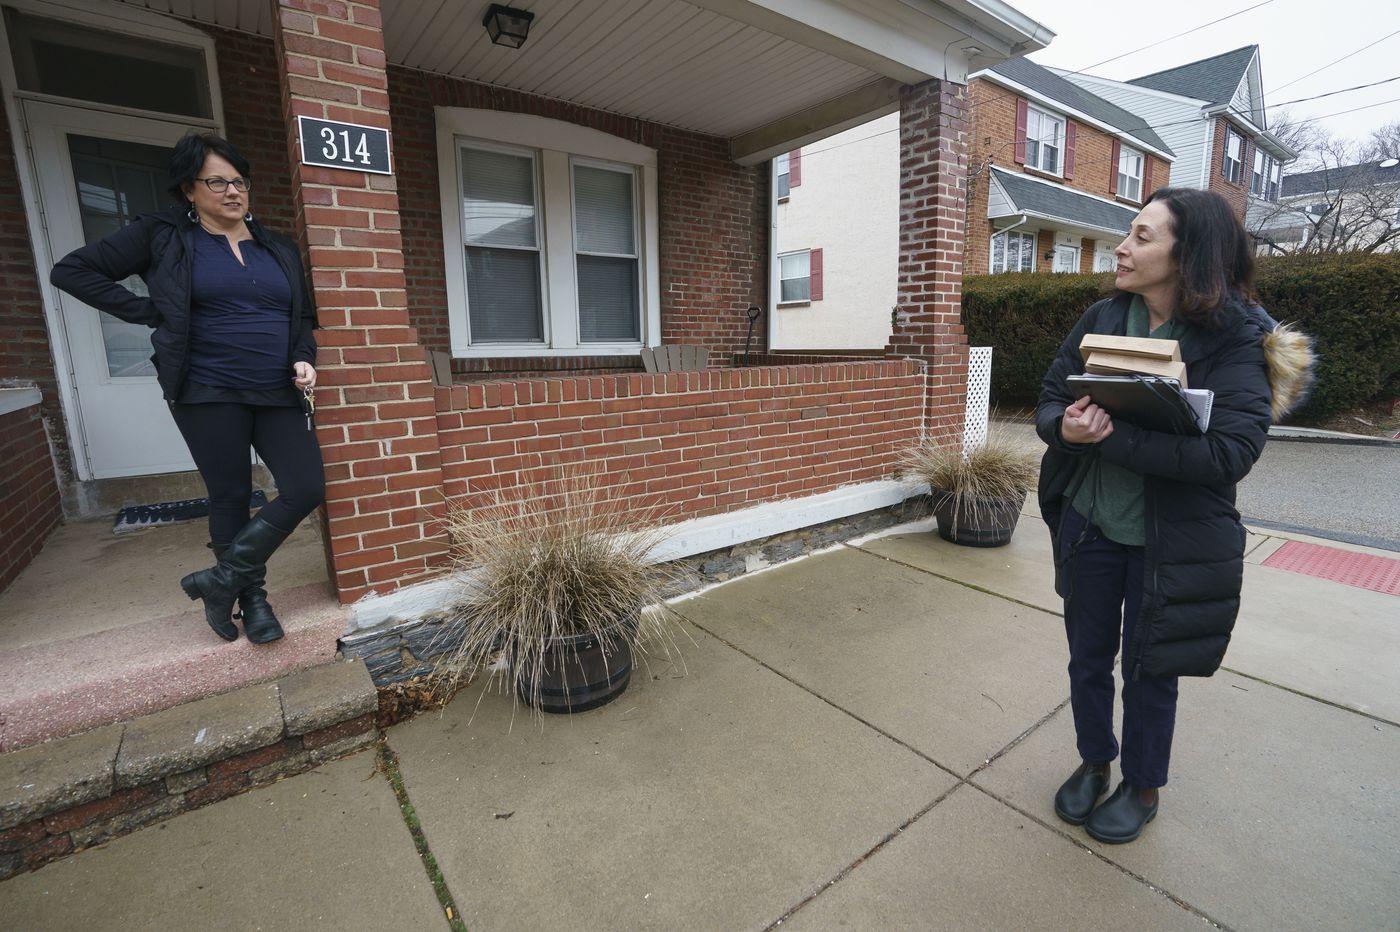 Turn Pa. Blue is the monster that Trump has awakened in Pennsylvania | Maria Panaritis